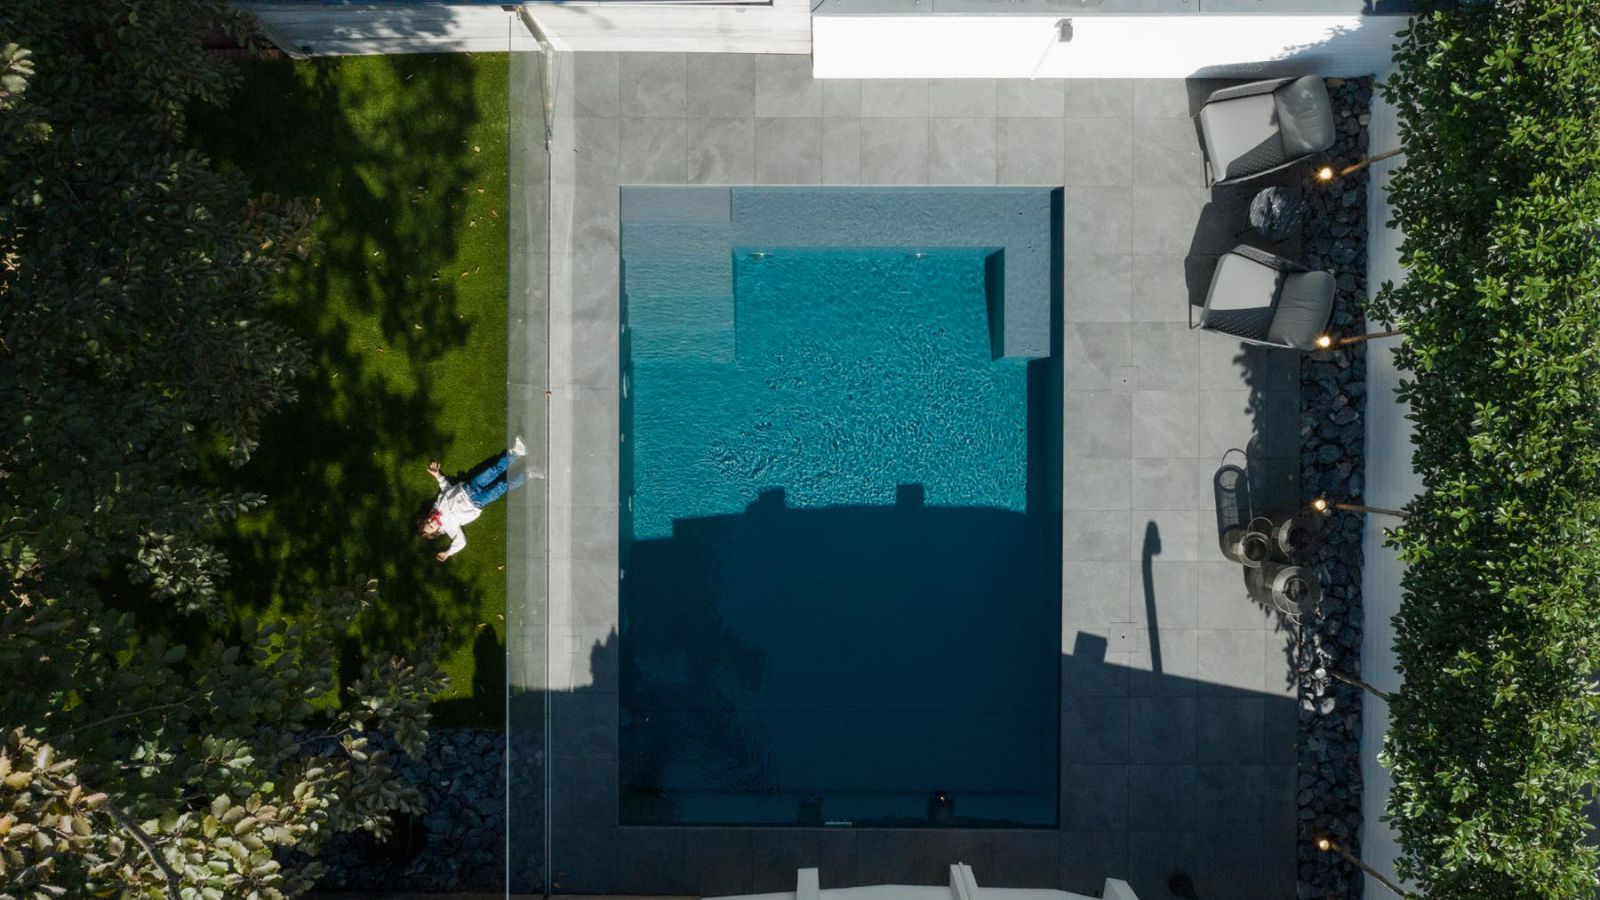 5.2 Designpool - Entspannung unter grünem Blätterdach in Bocholt